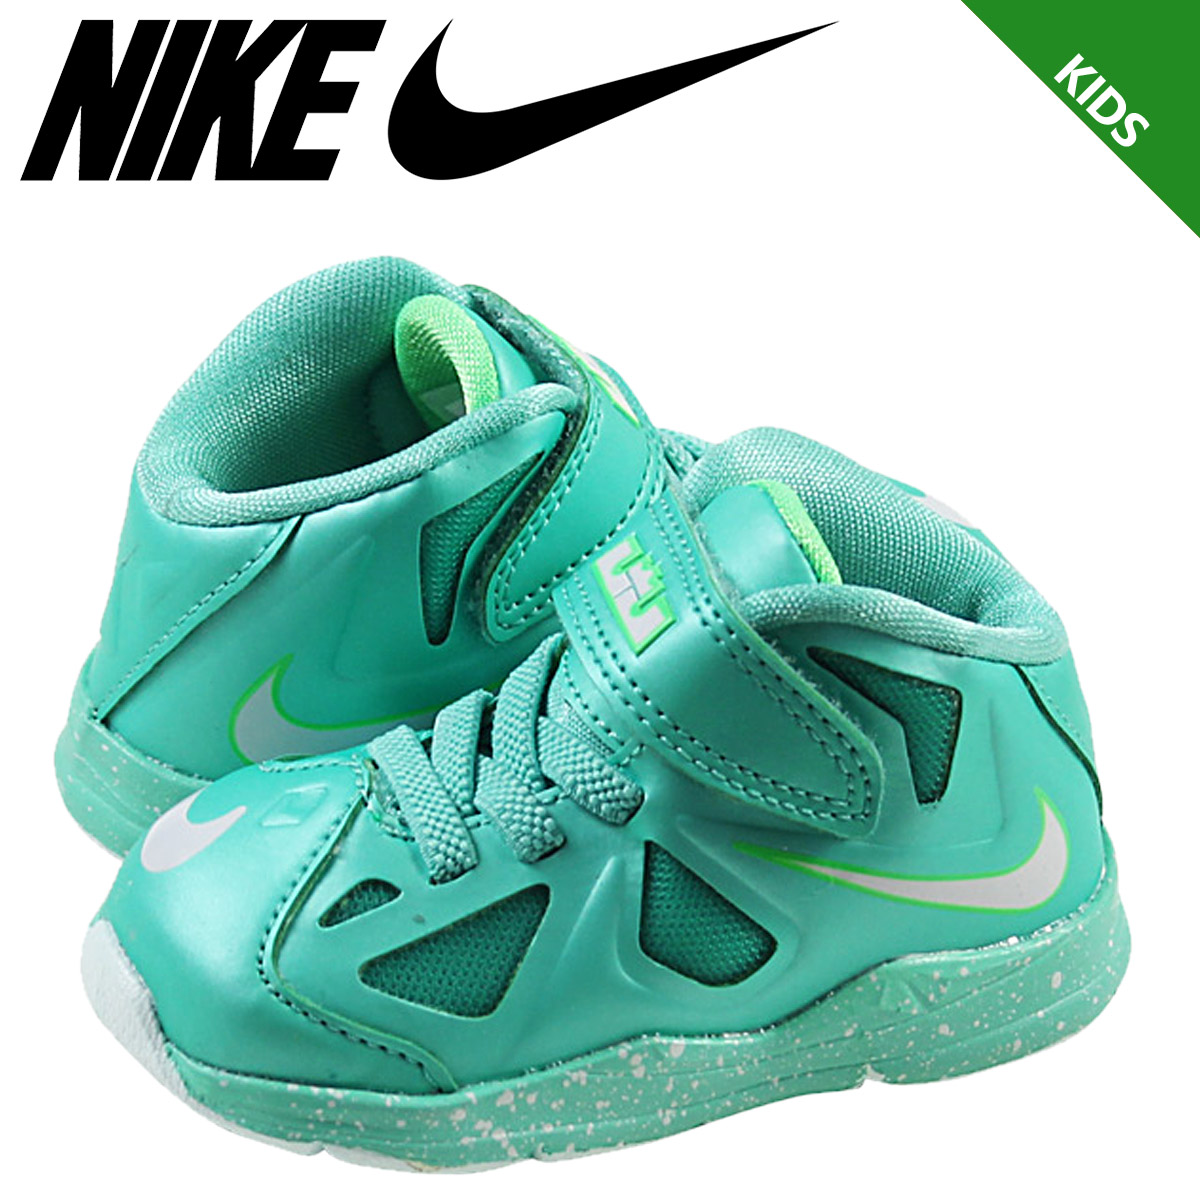 hot sale online c8af0 4da7f baby lebron james shoes Sale ,up to 38% Discounts